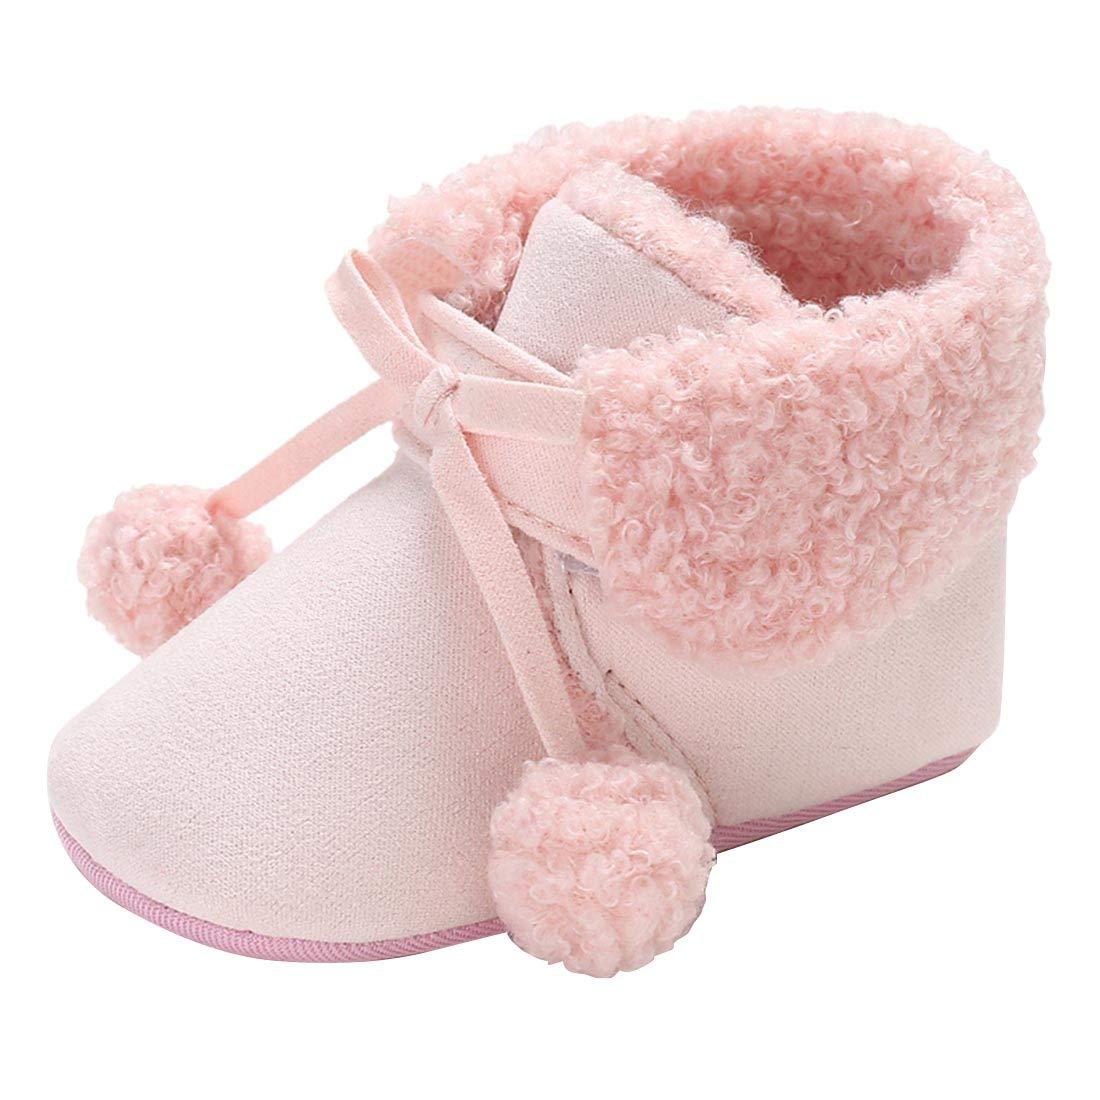 26bfce80451 YIBLBOX Newborn Baby Booties